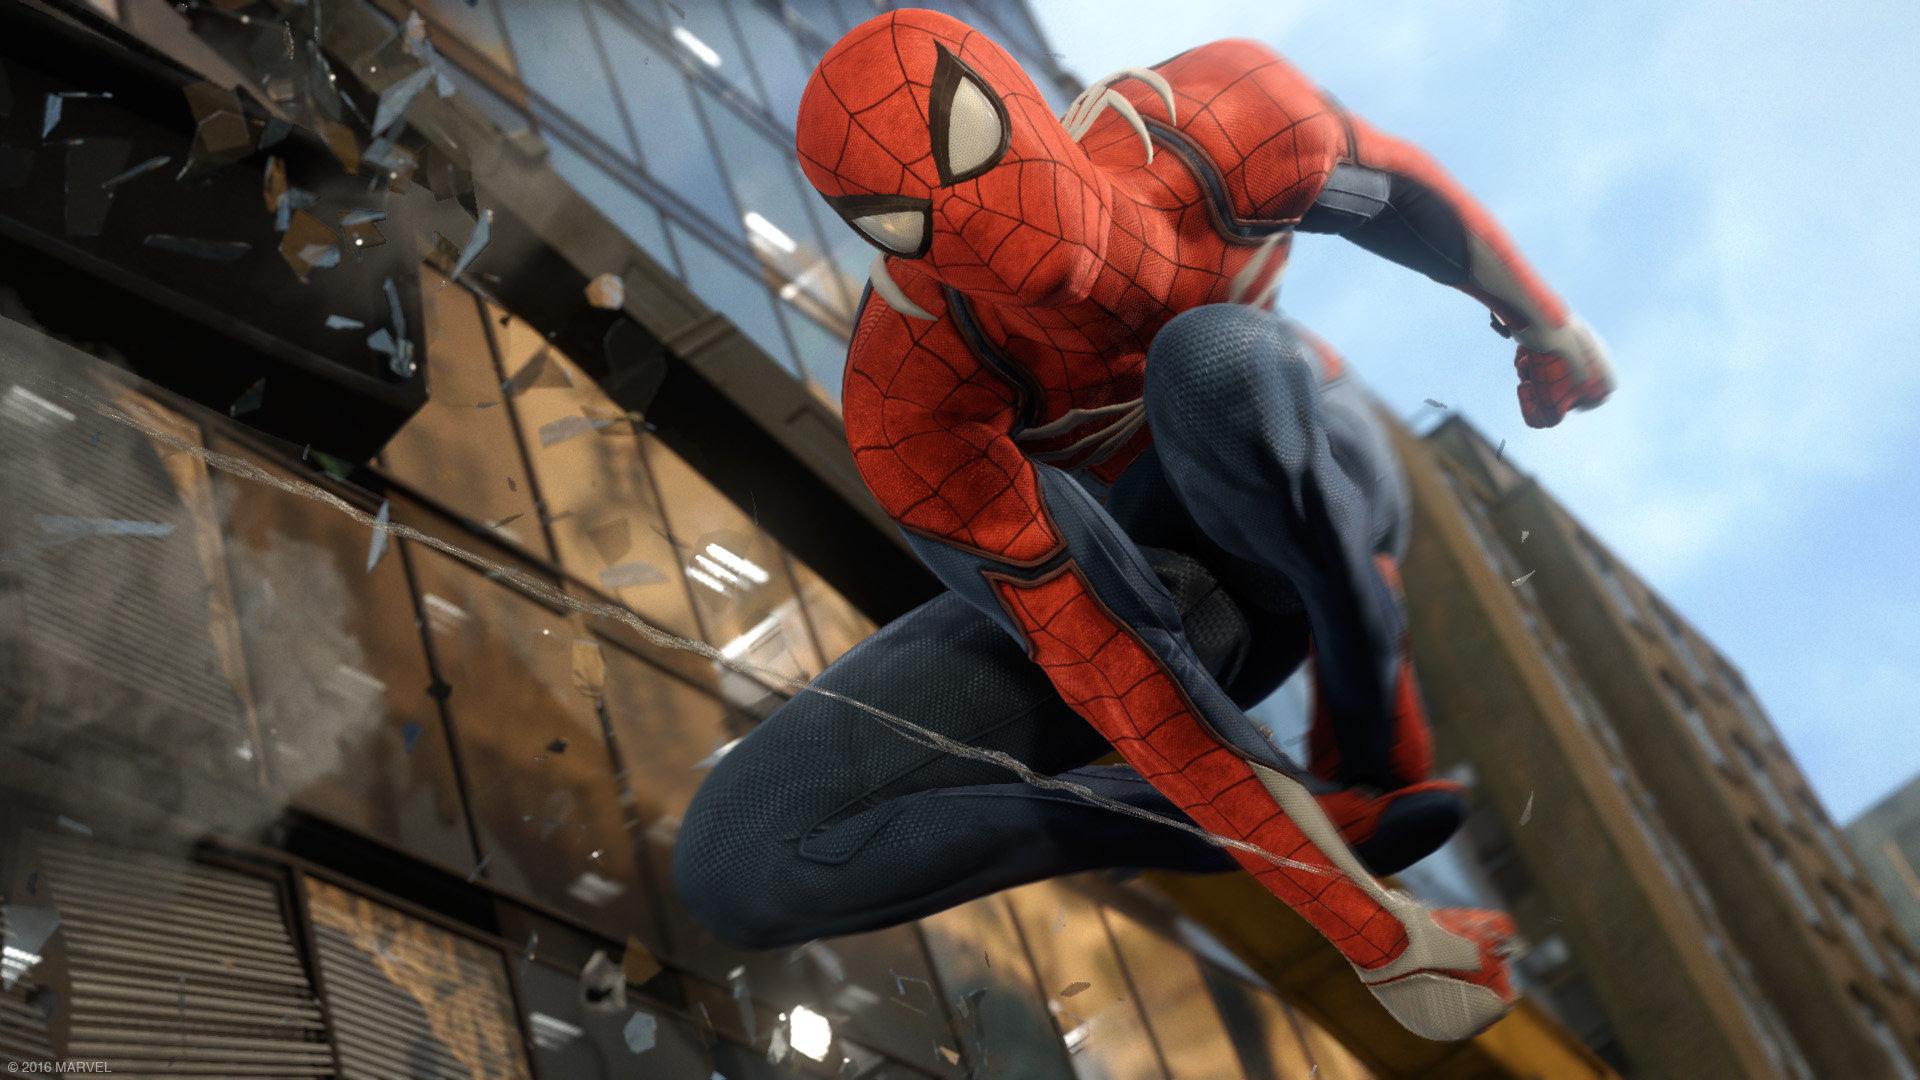 marvels spider-man ps4 2018 1